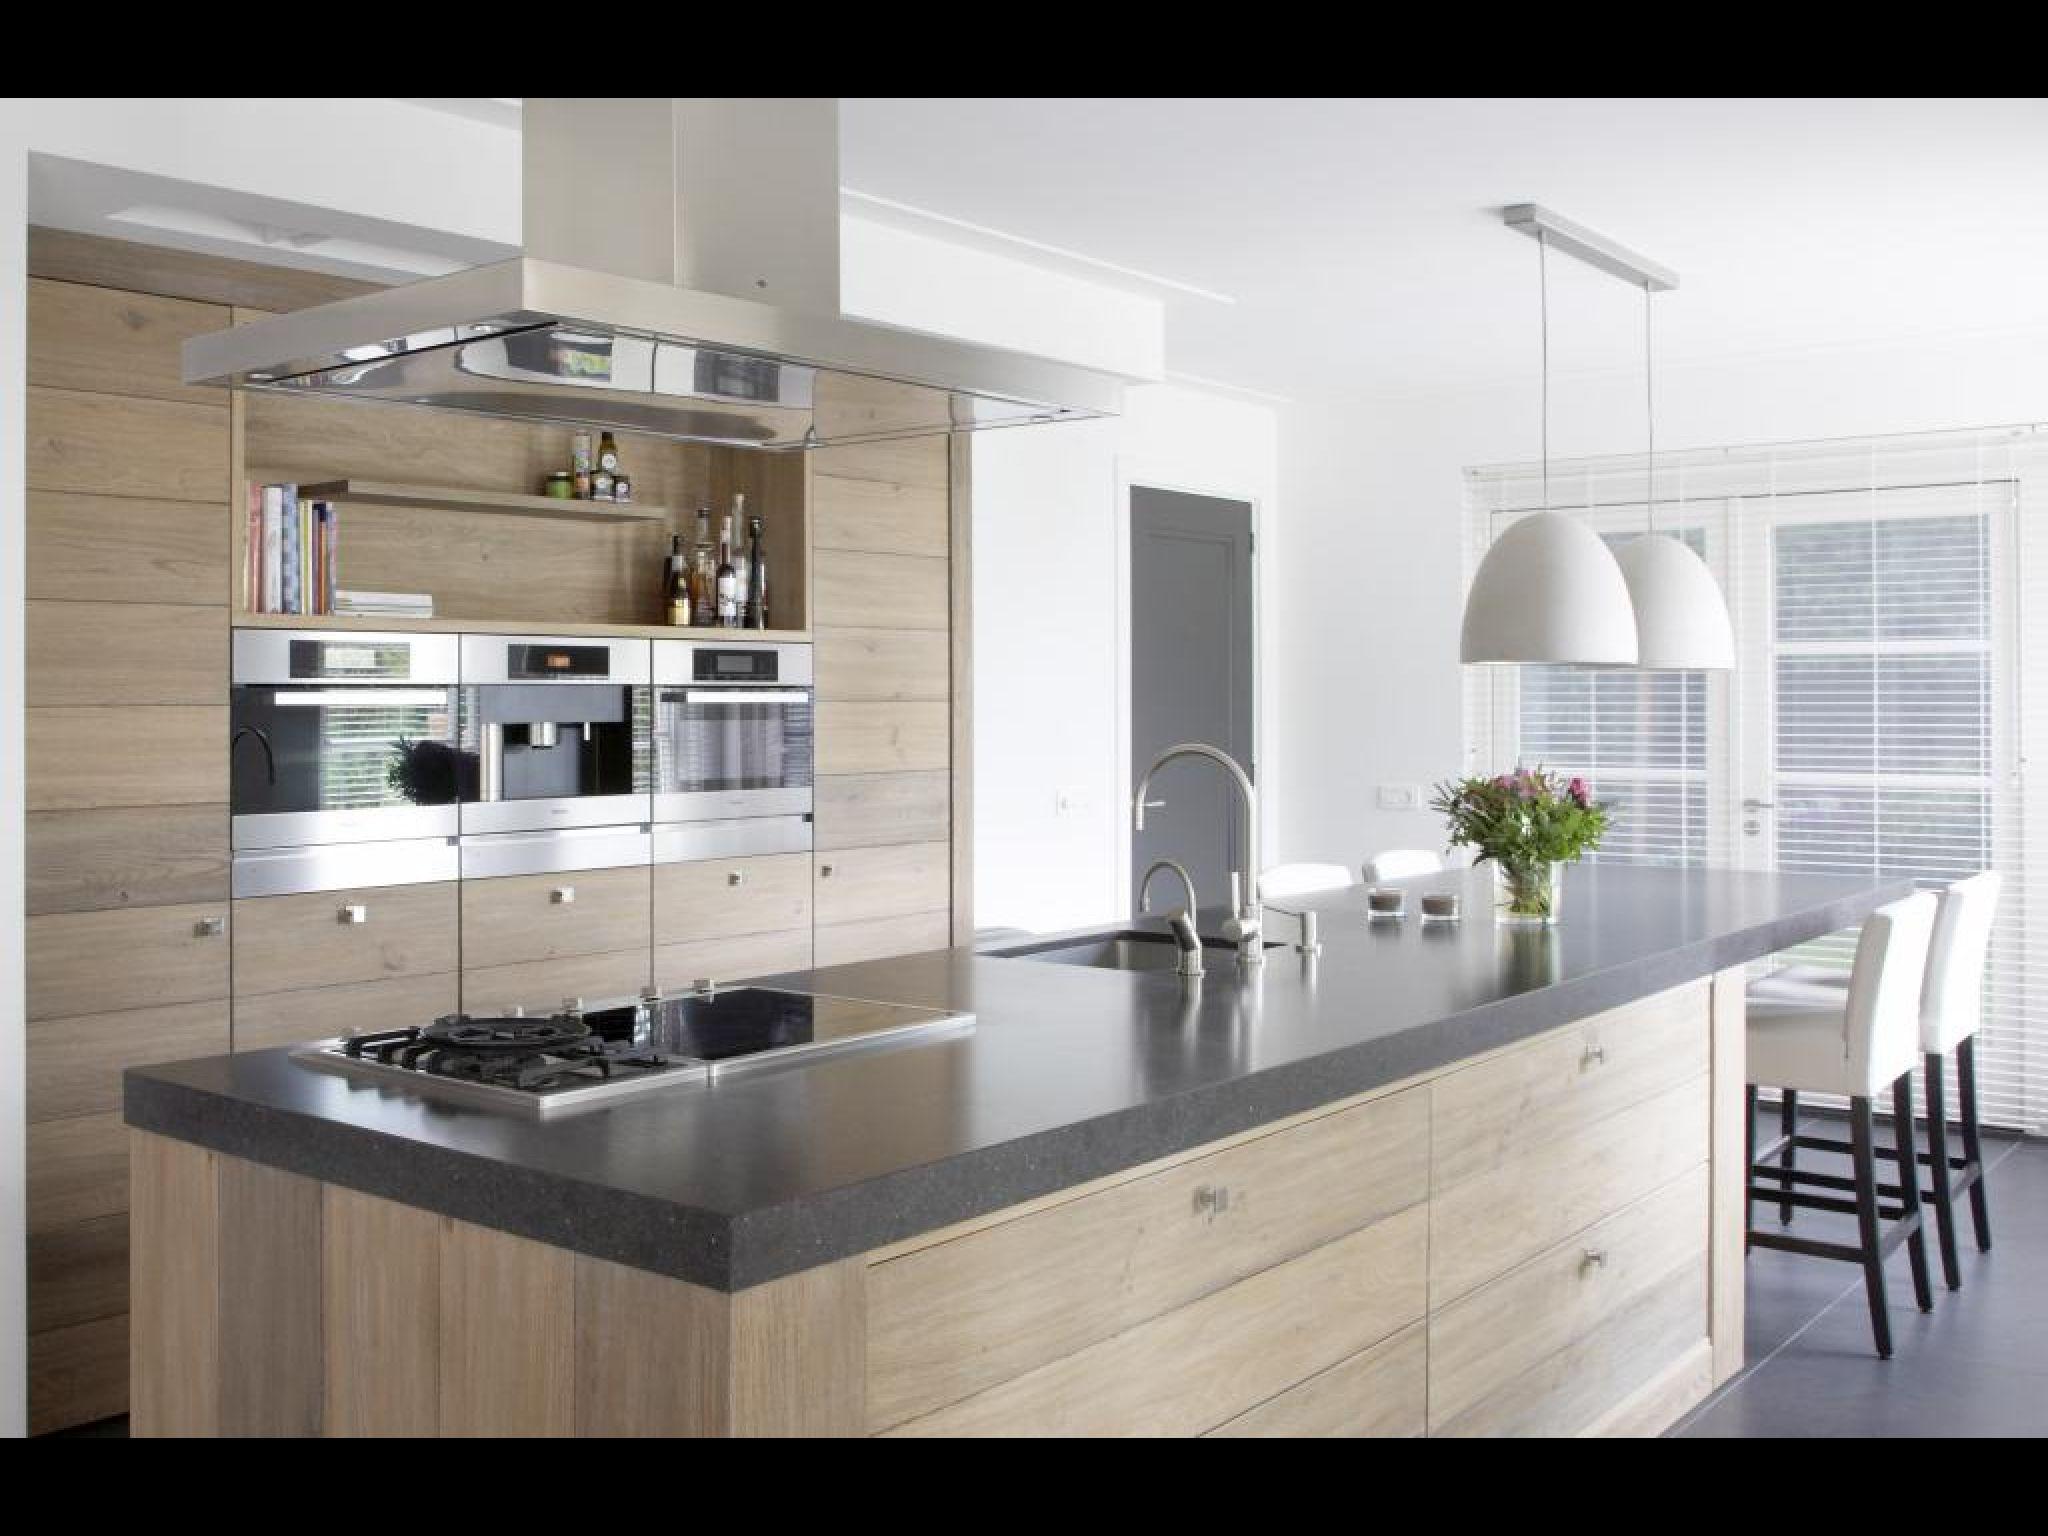 Keuken Ideeen Landelijk : Landelijk modern tinello keuken modern keuken